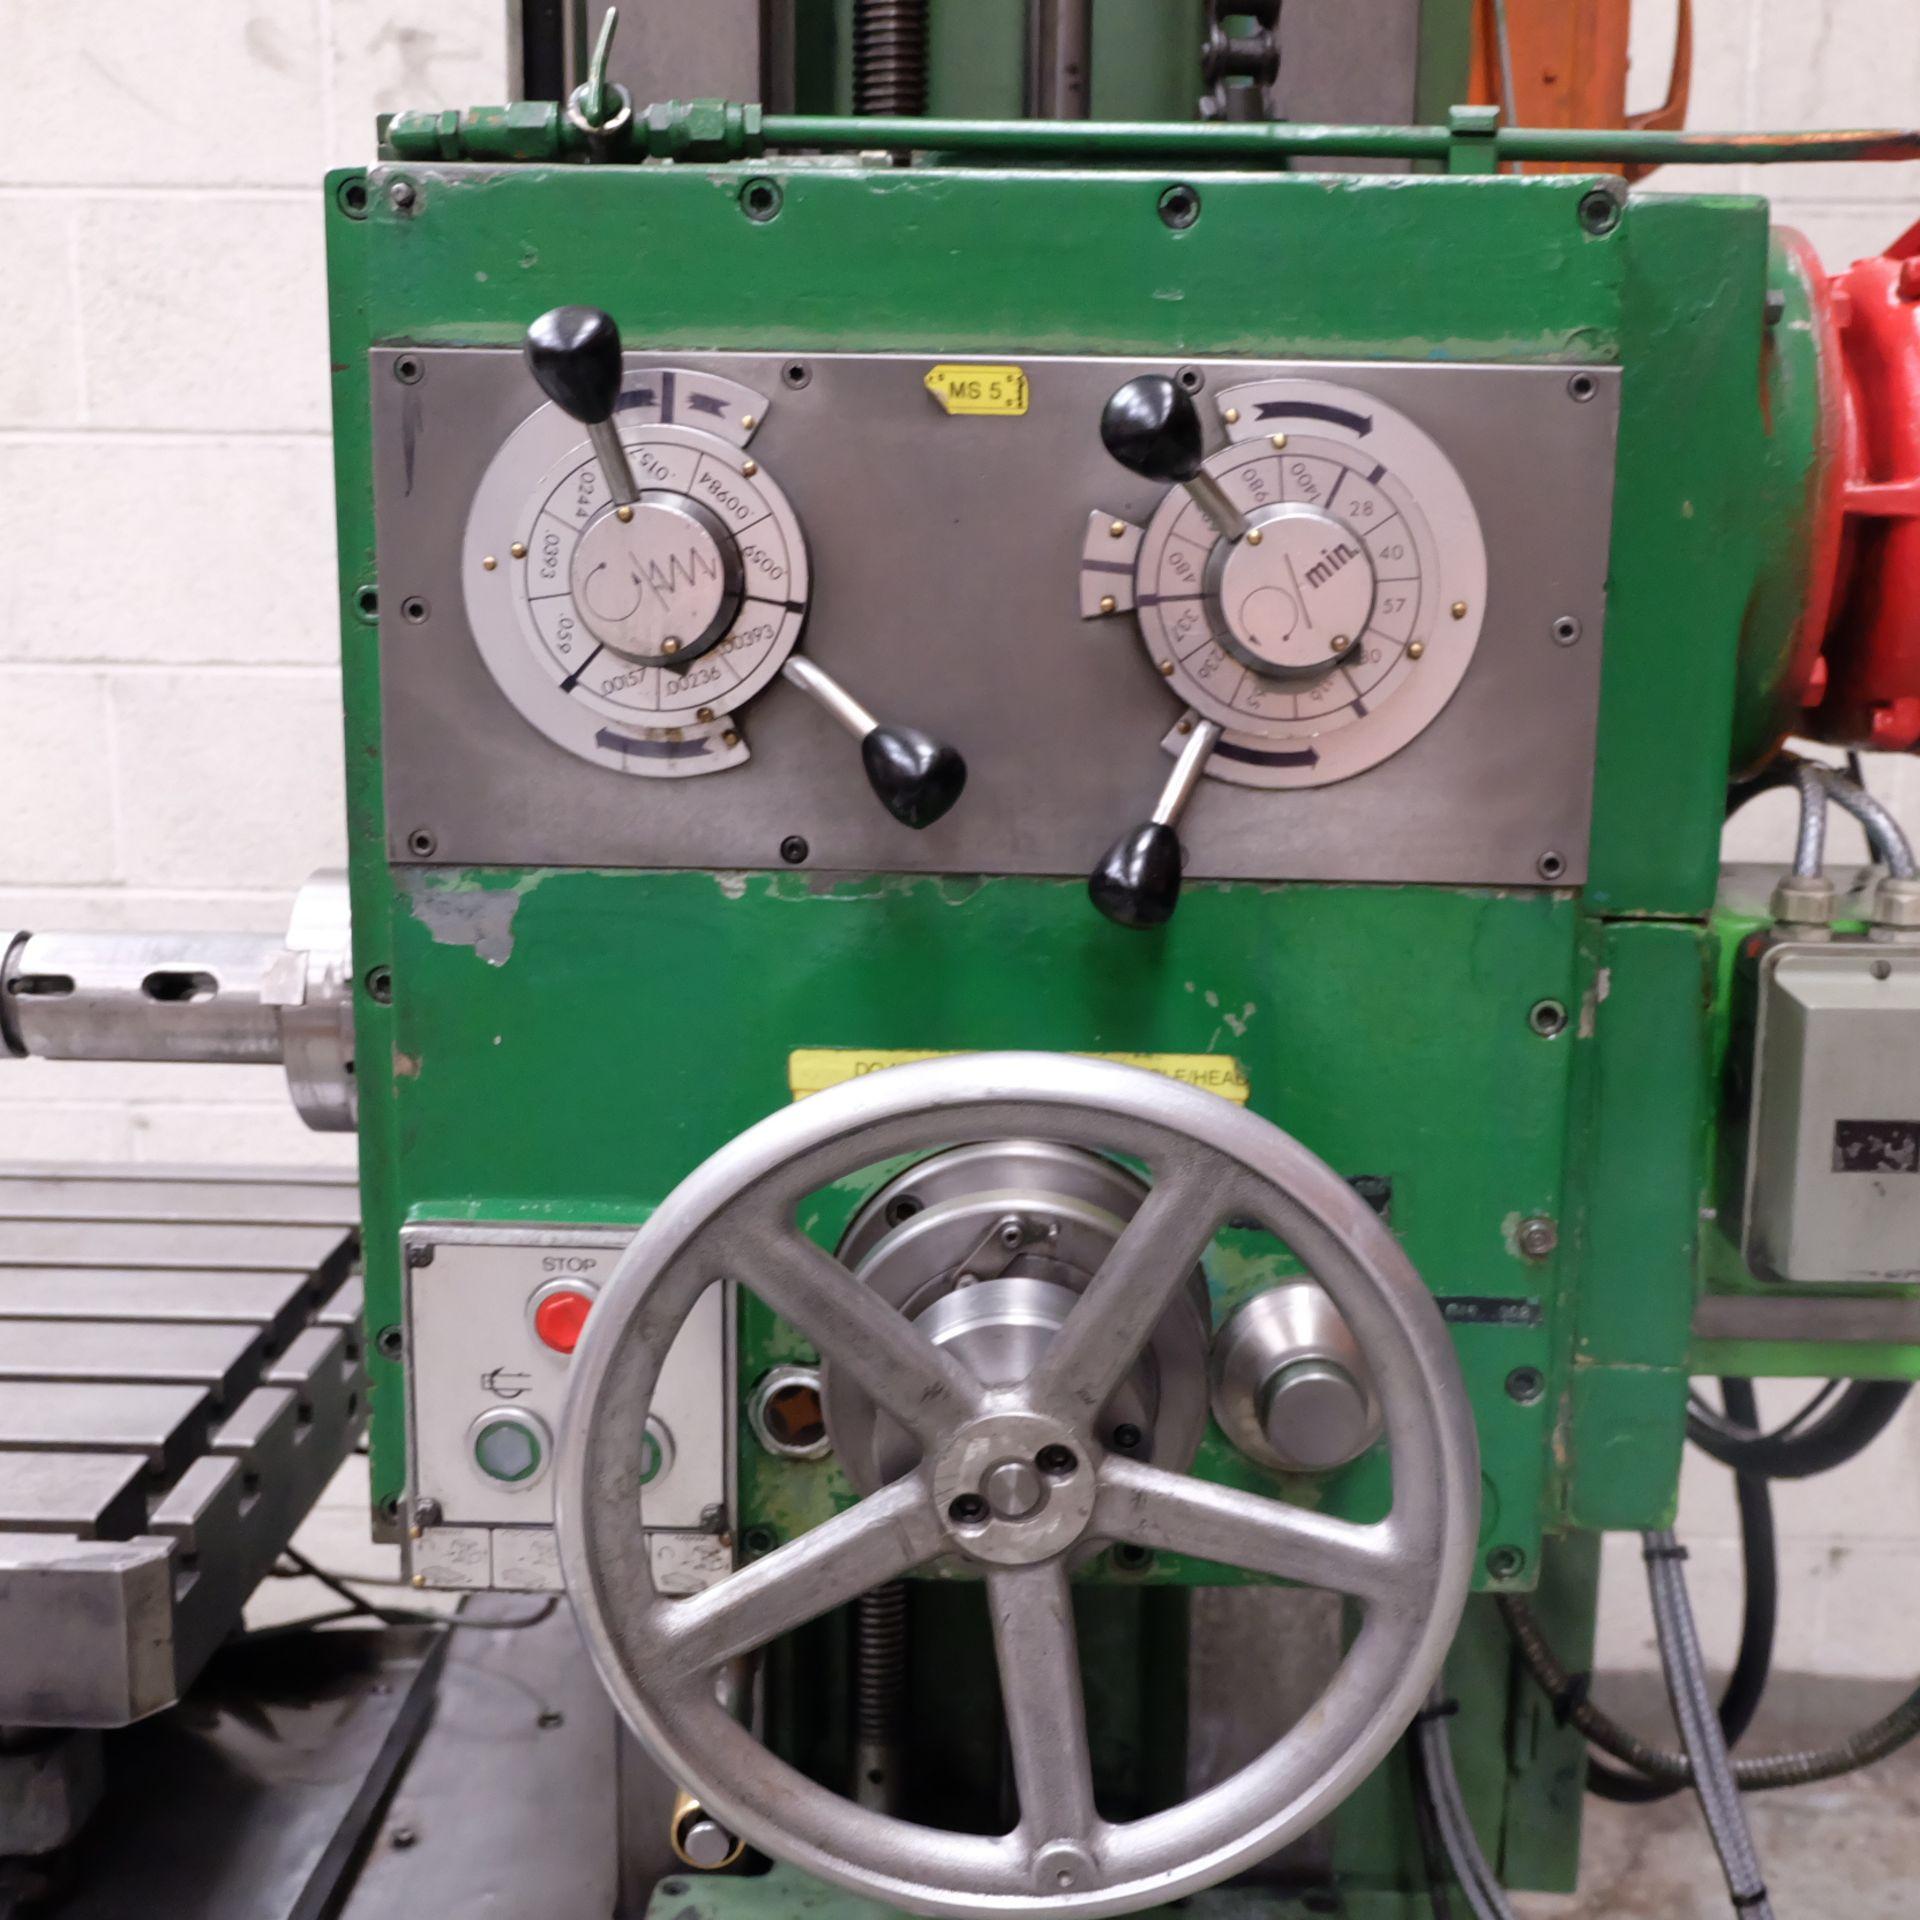 Lot 34 - A JUARISTI Horizontal Boring Machine, Rotating Tab